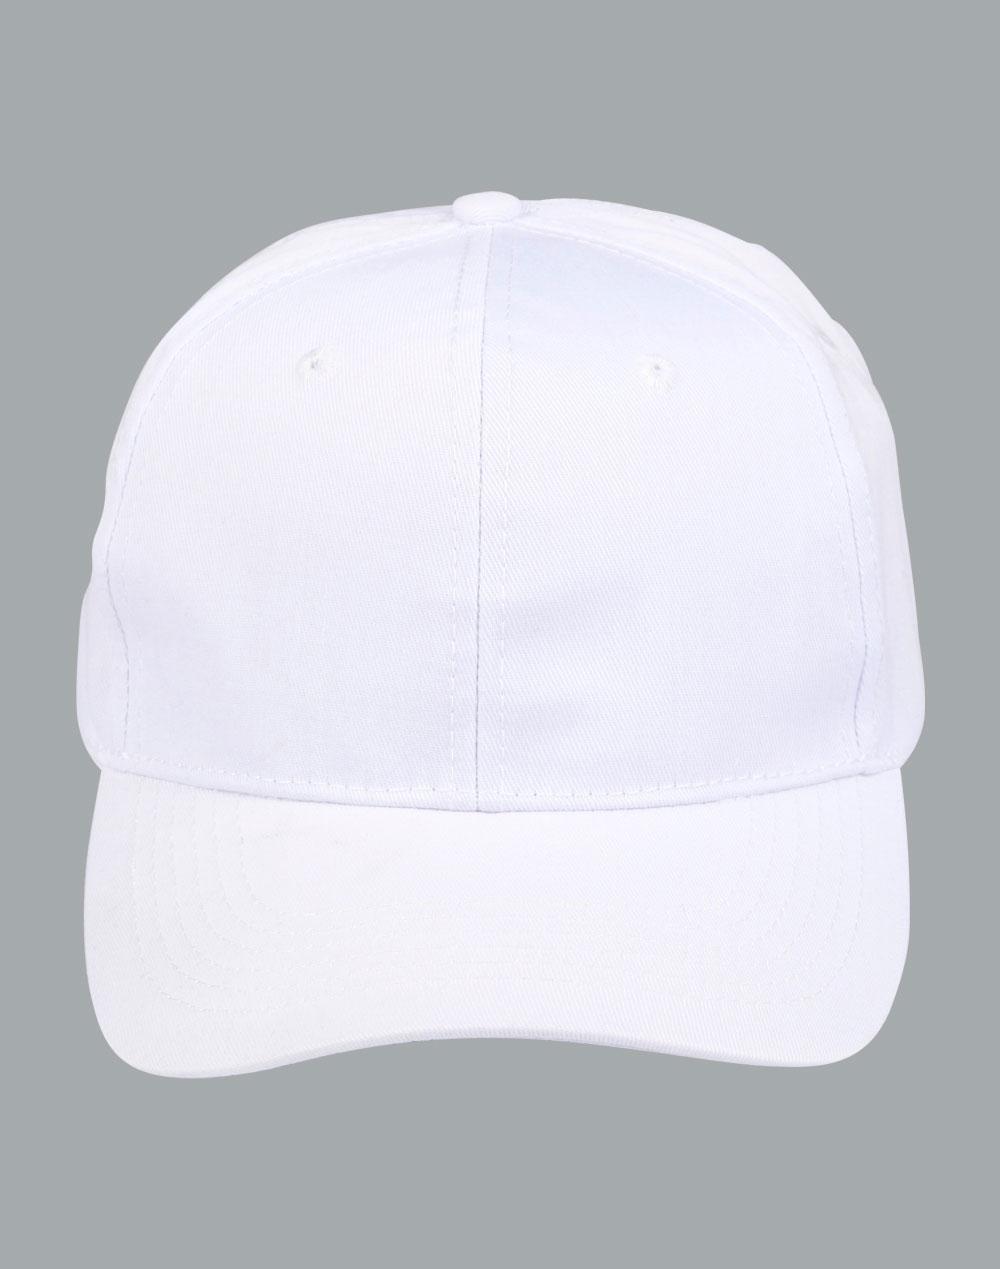 Caps : PLAIN COTTON TWILL CAP CH13